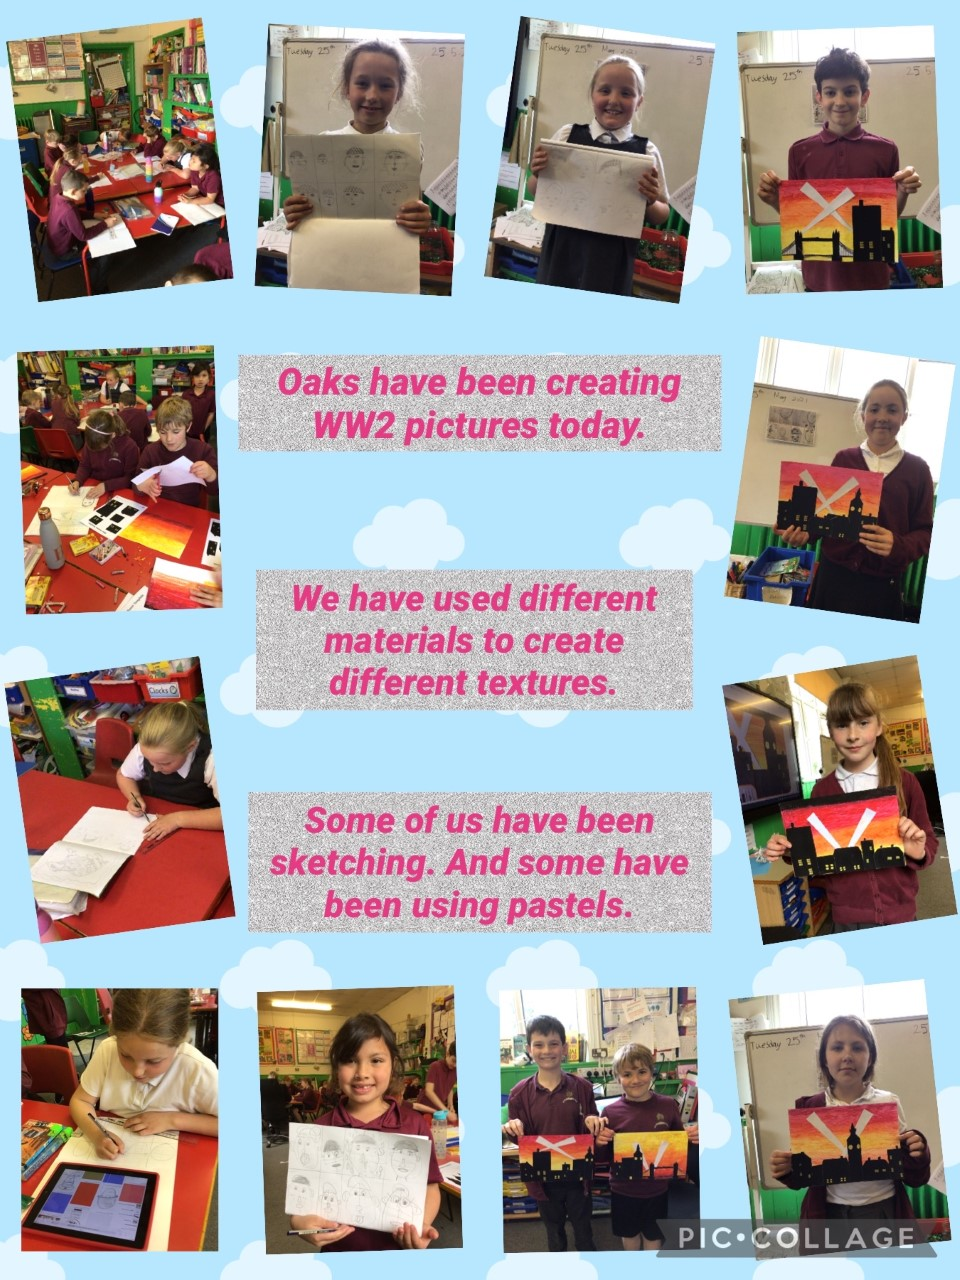 Oaks Photomontage 27-5